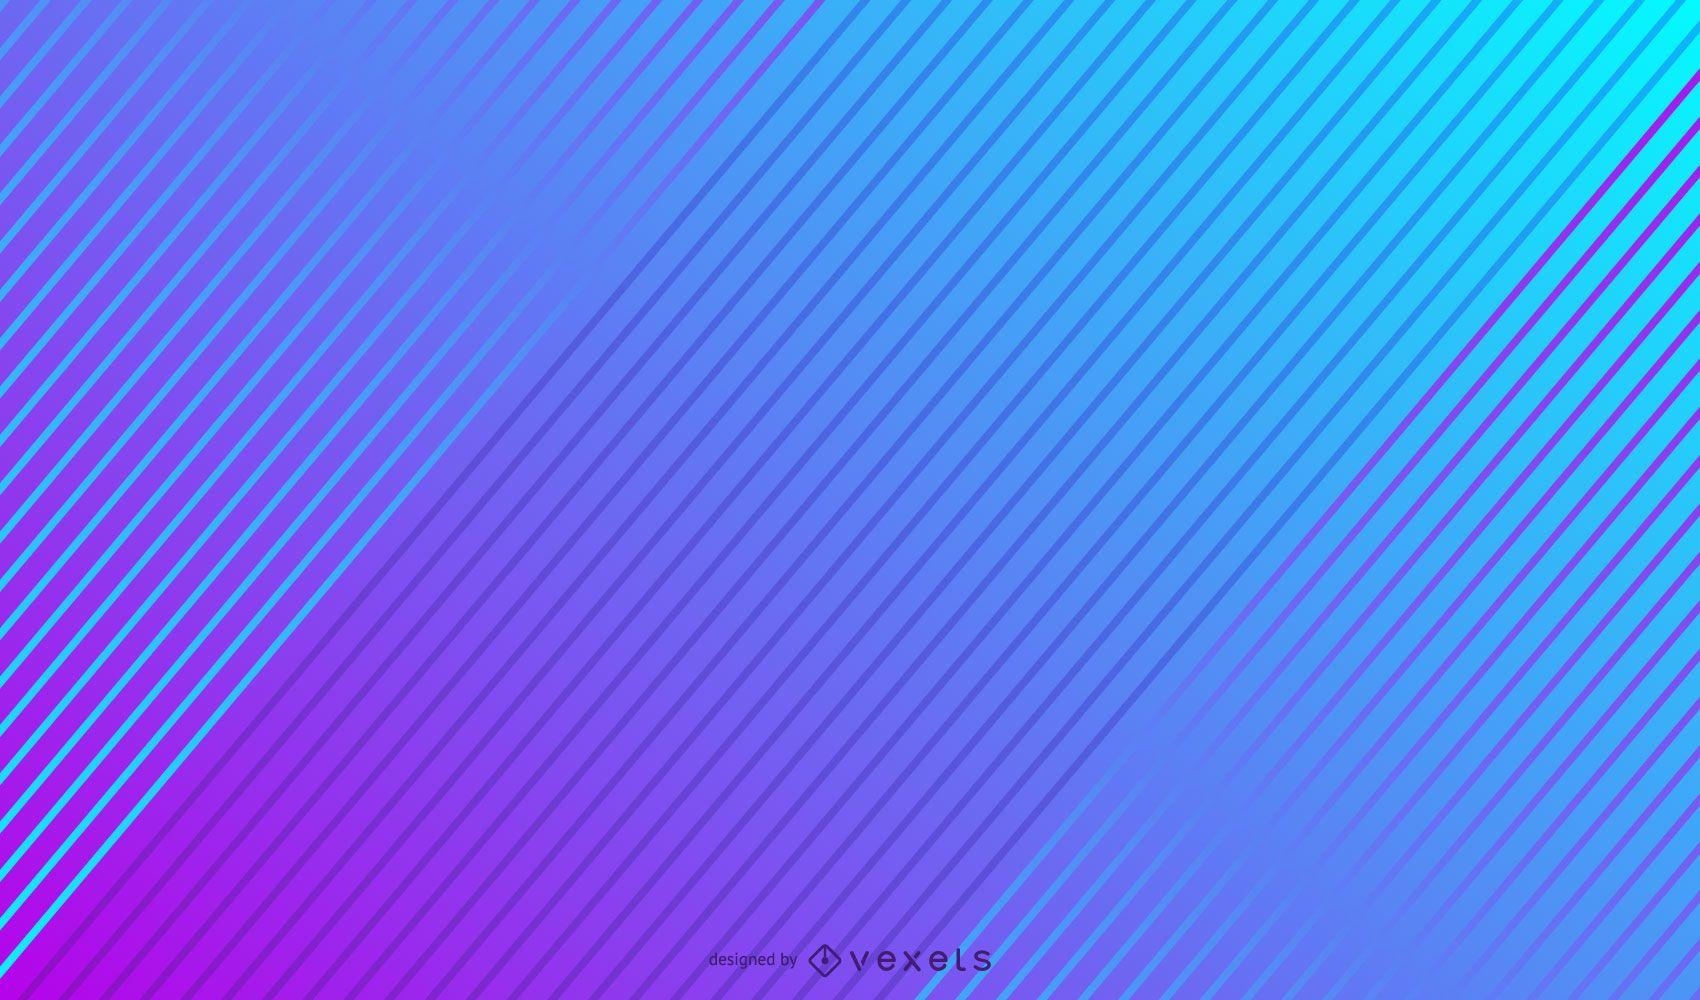 Diagonal lines gradient background